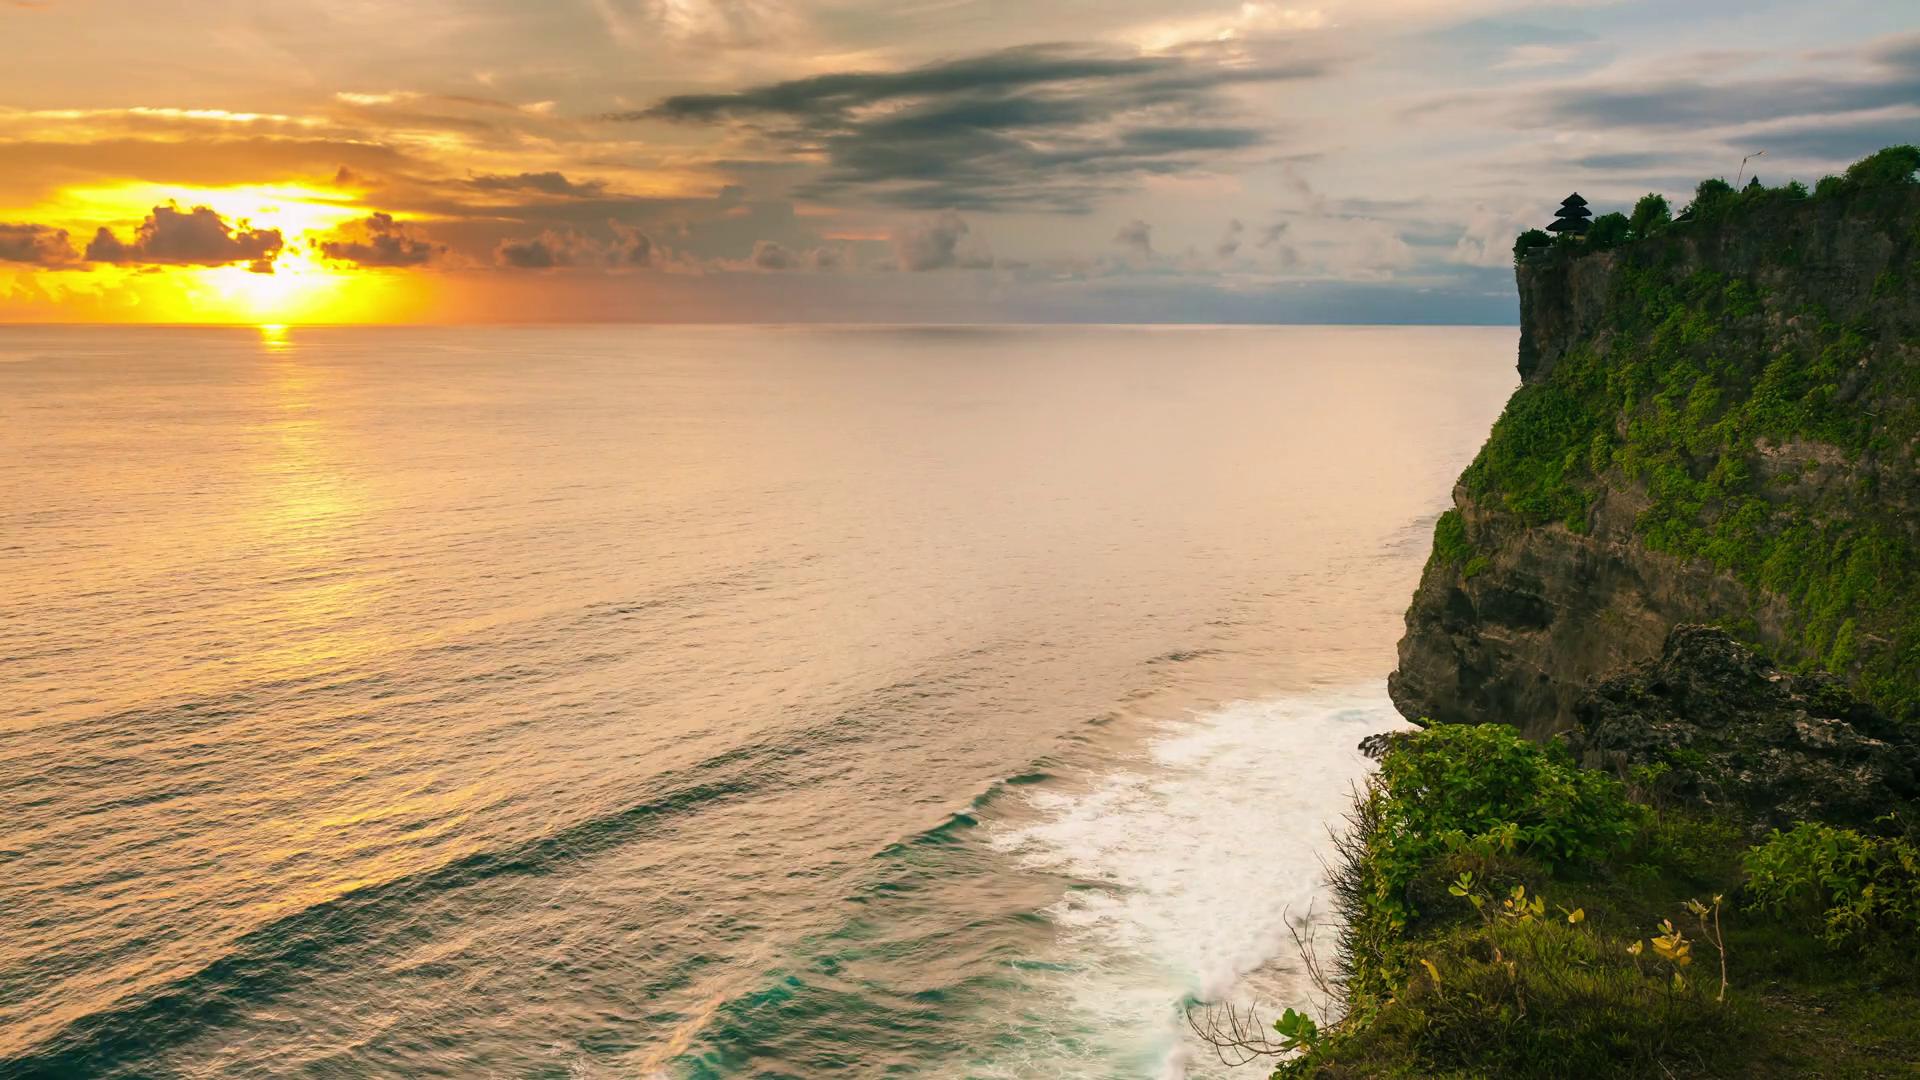 Popular Tourist Attractions Tropical Island Bali Landmarks 4k Pura Luhur